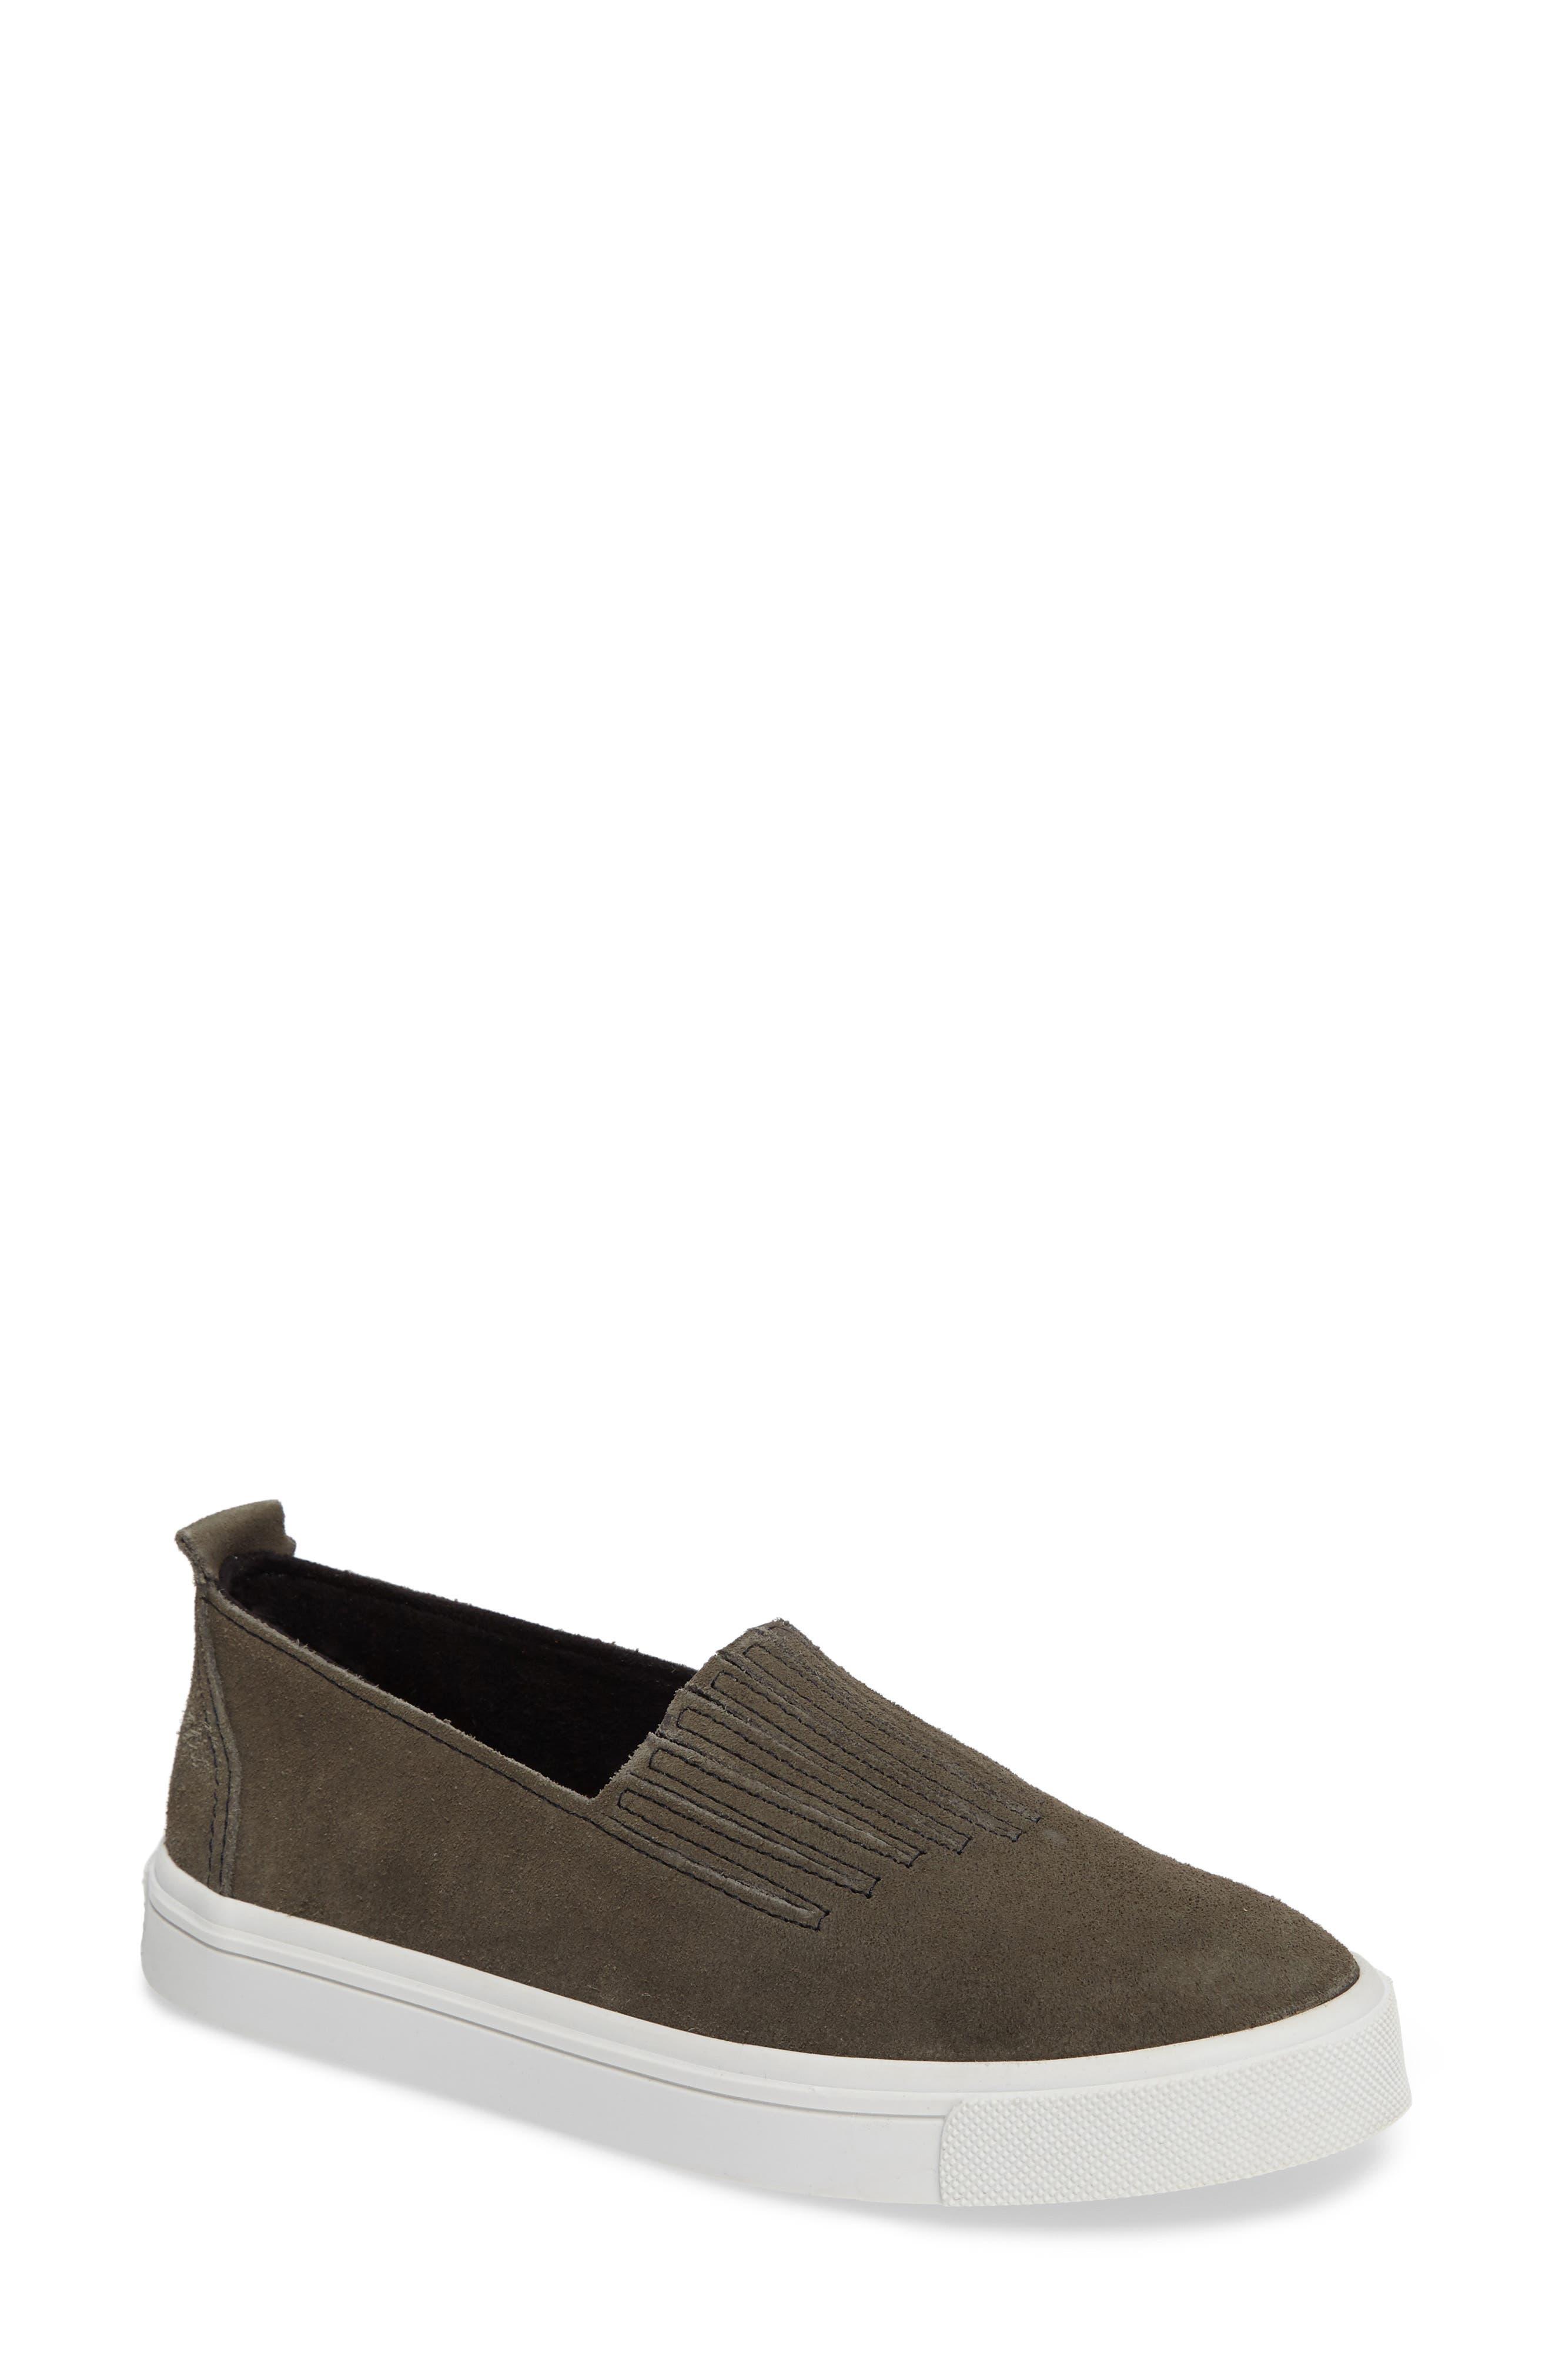 Minnetonka Gabi Slip-On Sneaker, Grey